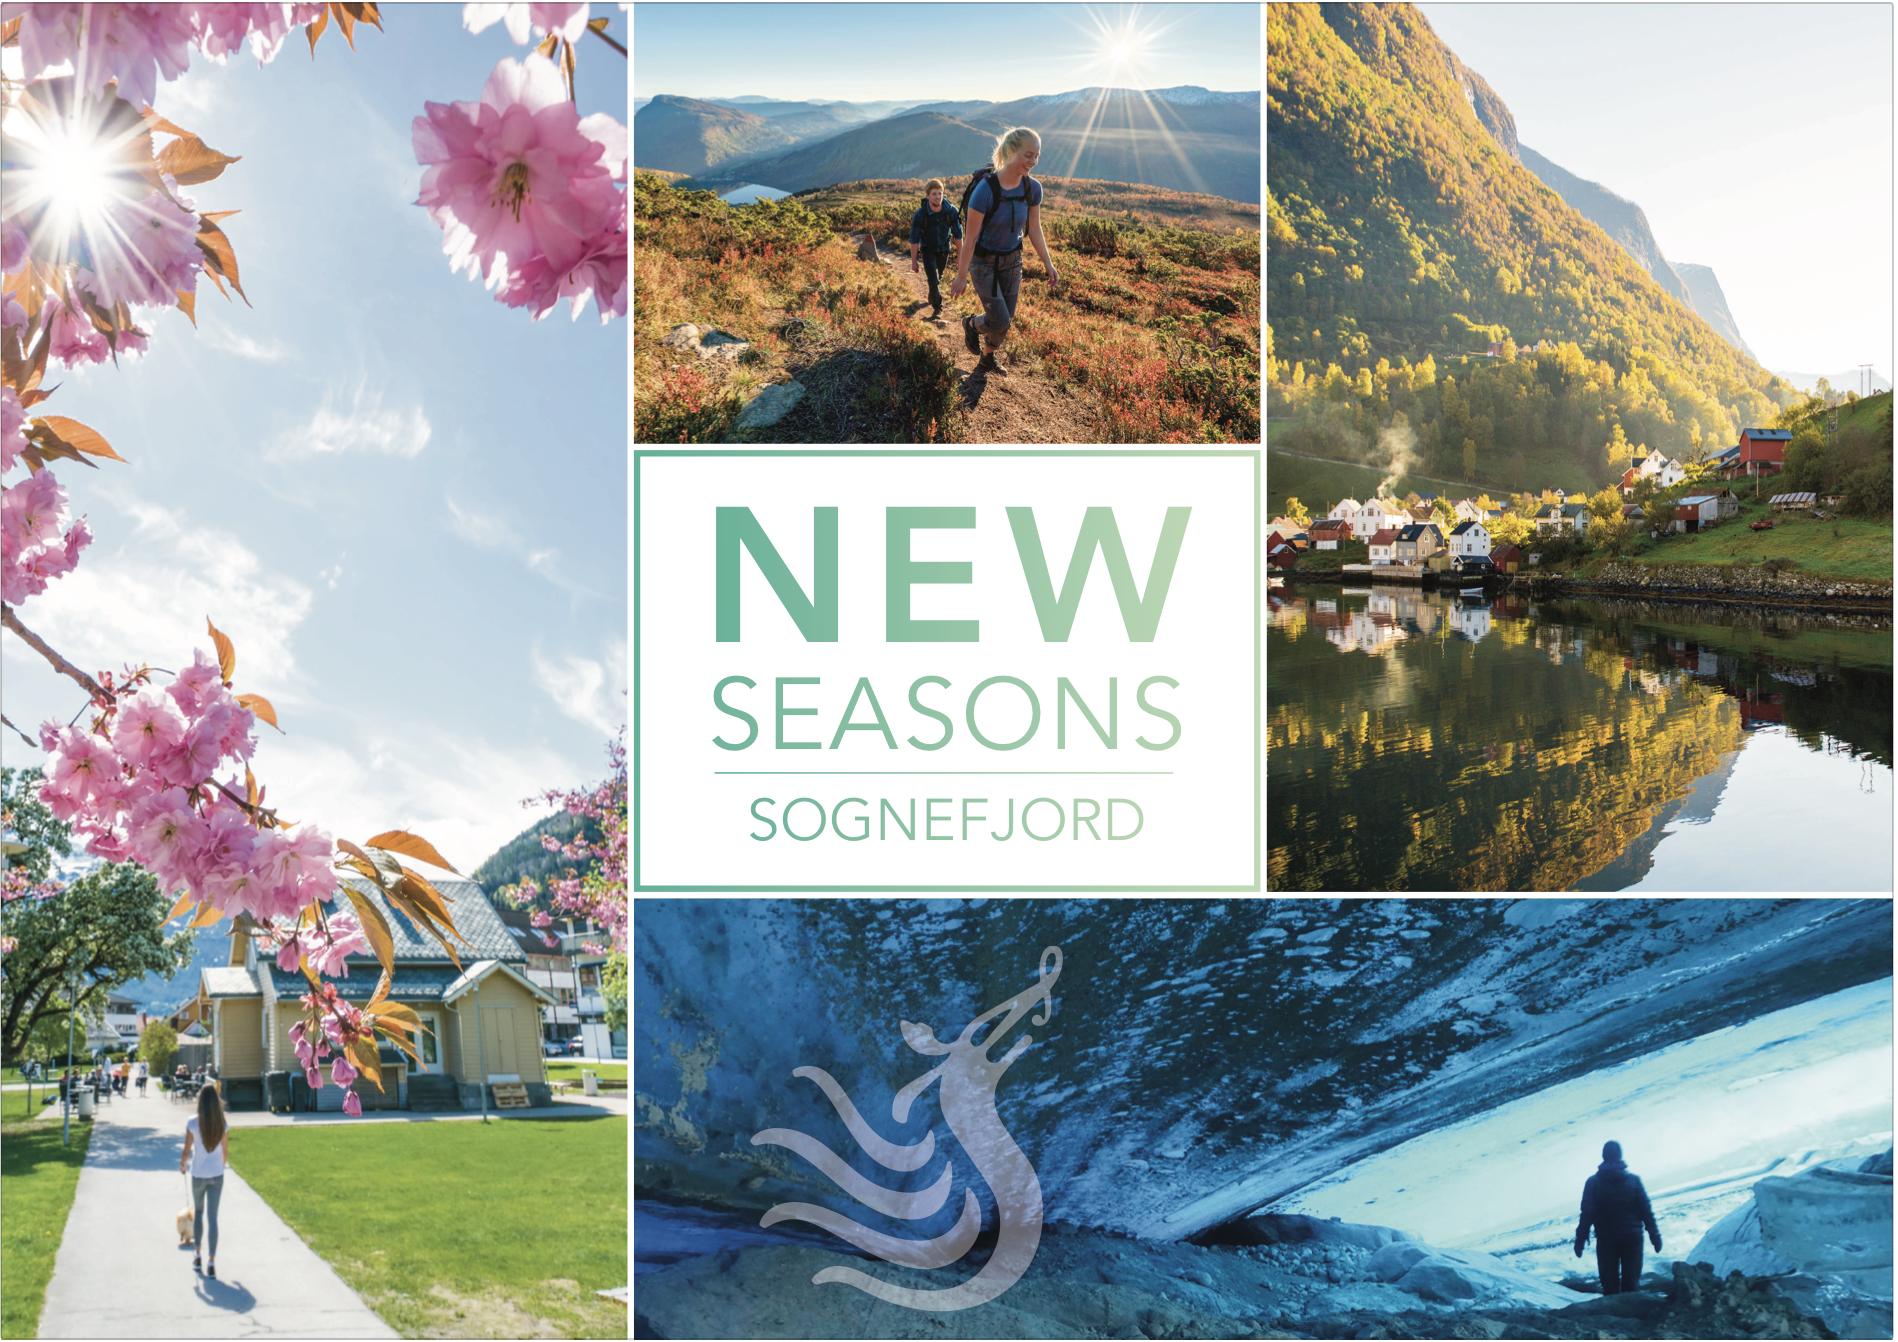 New Seasons 2017-2018 - Visit Sognefjord